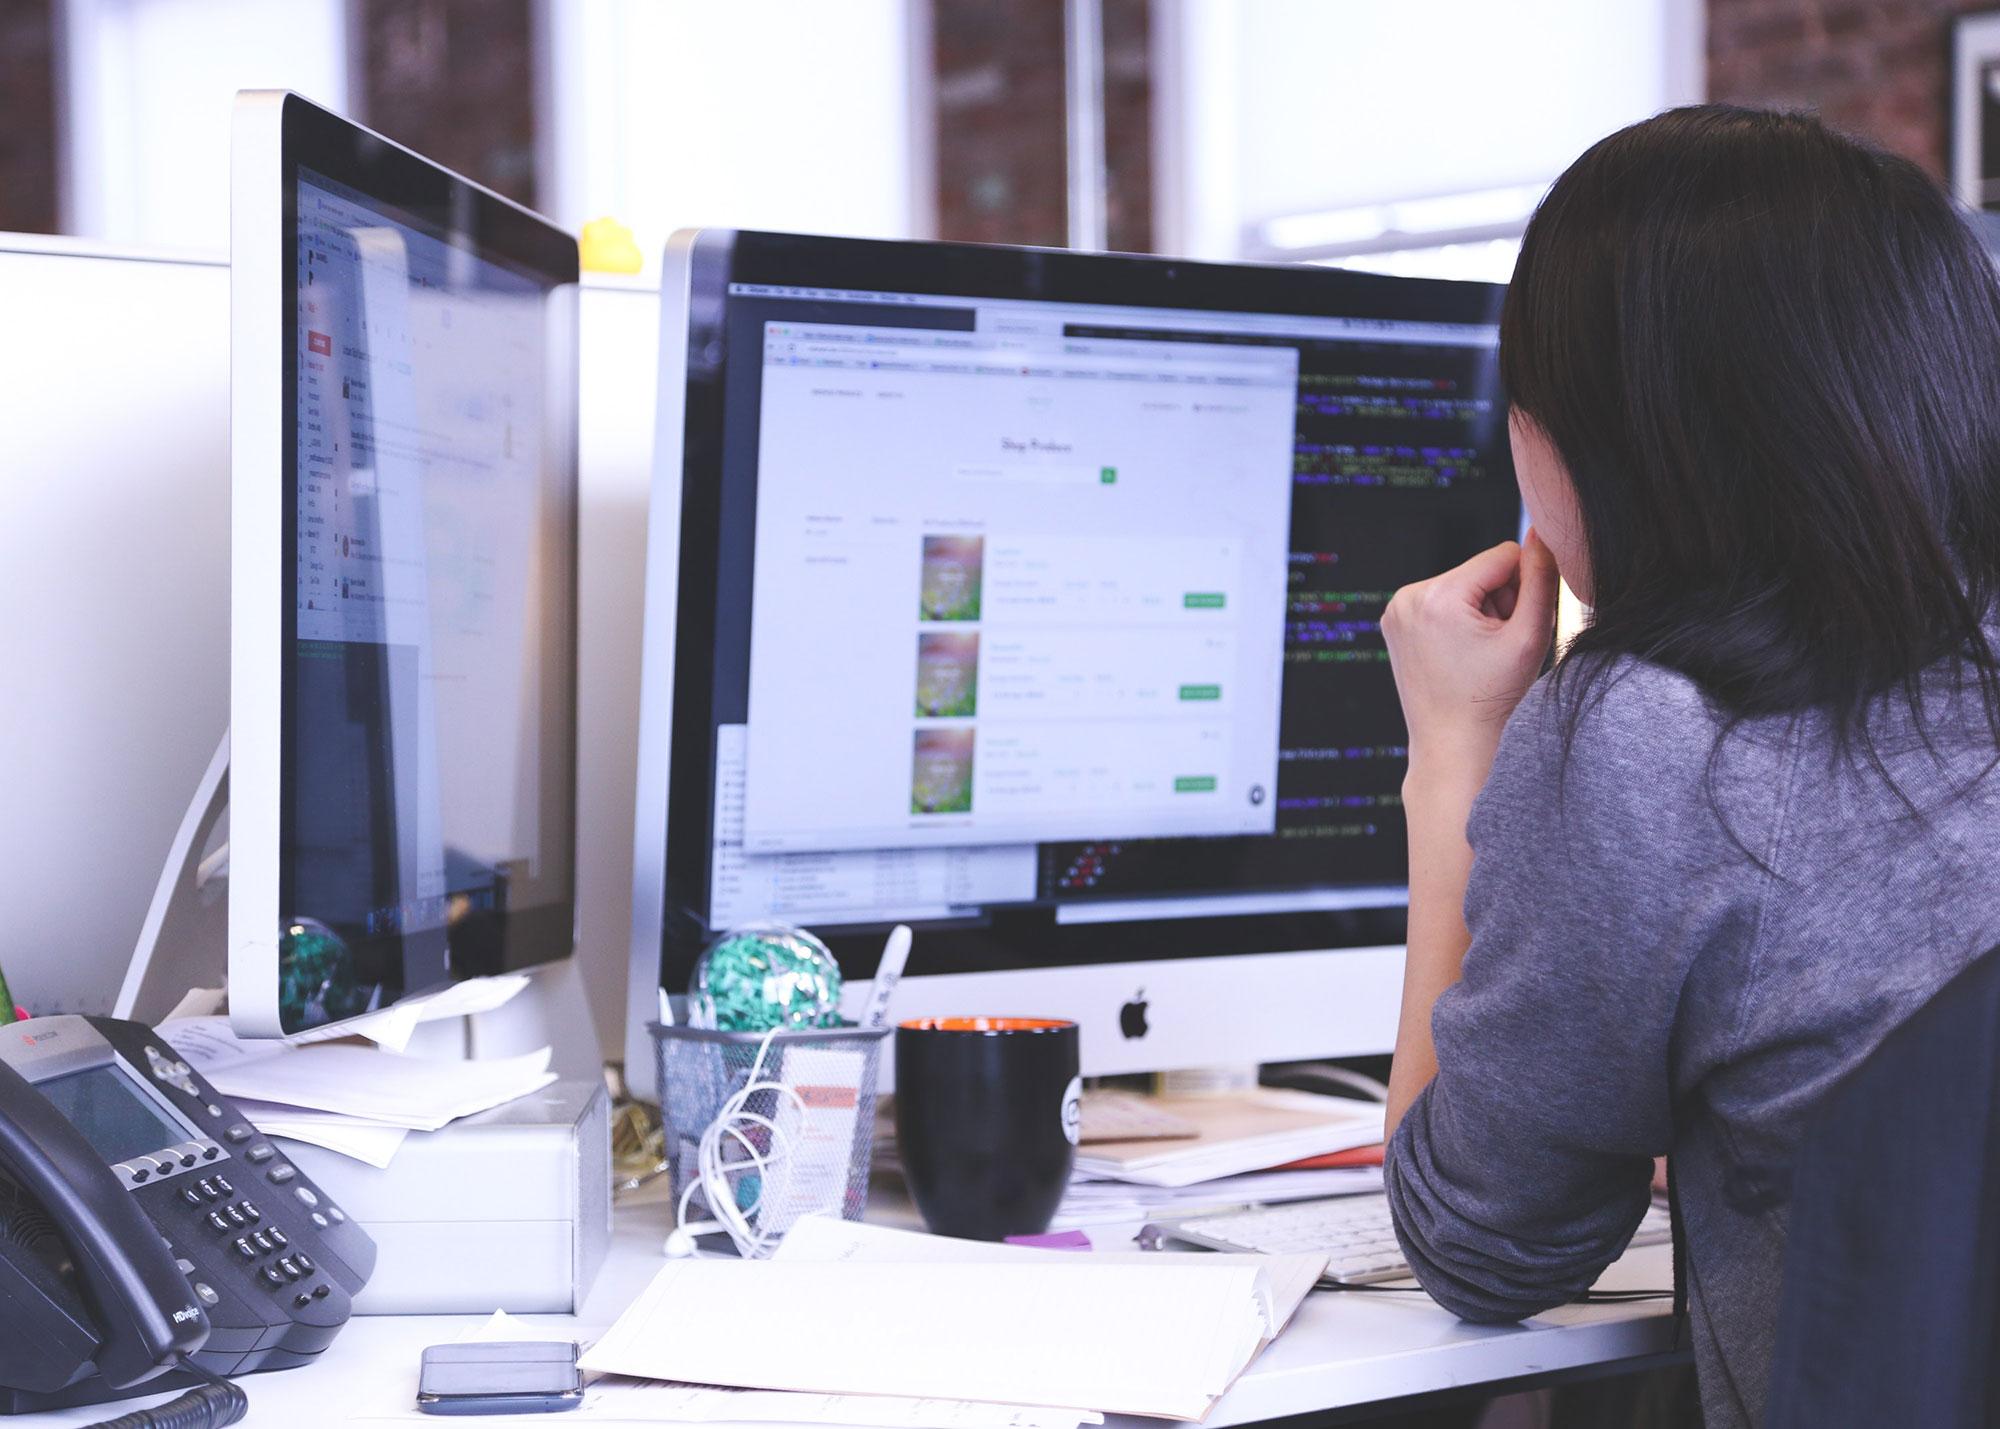 ATS ou logiciel de recrutement adapté